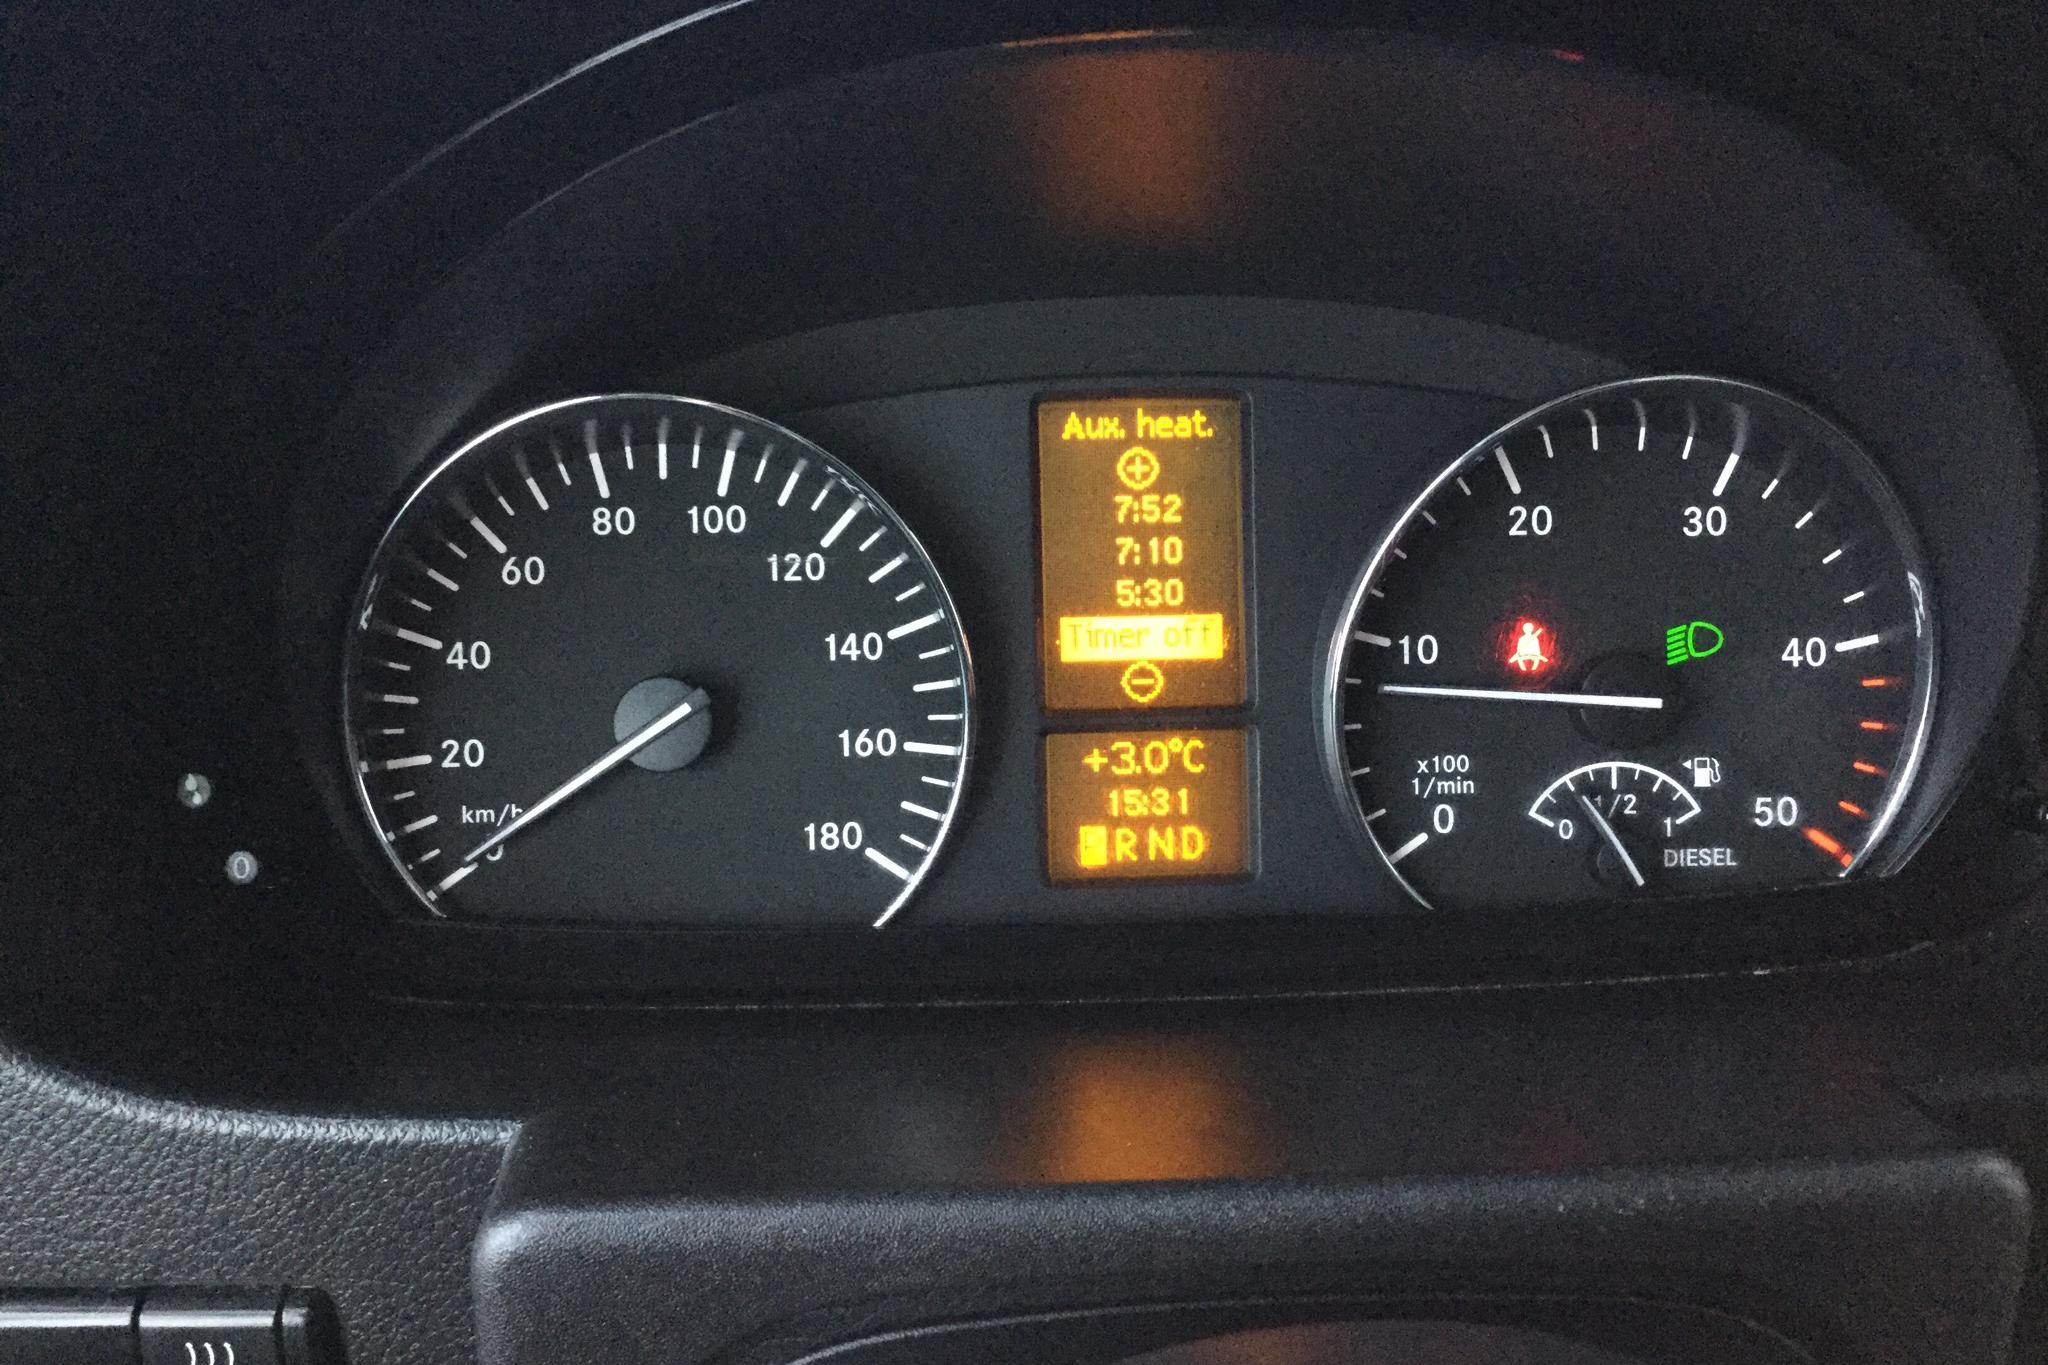 Mercedes Sprinter 316 CDI Pickup/Chassi (163hk) - 15 309 mil - Automat - vit - 2017